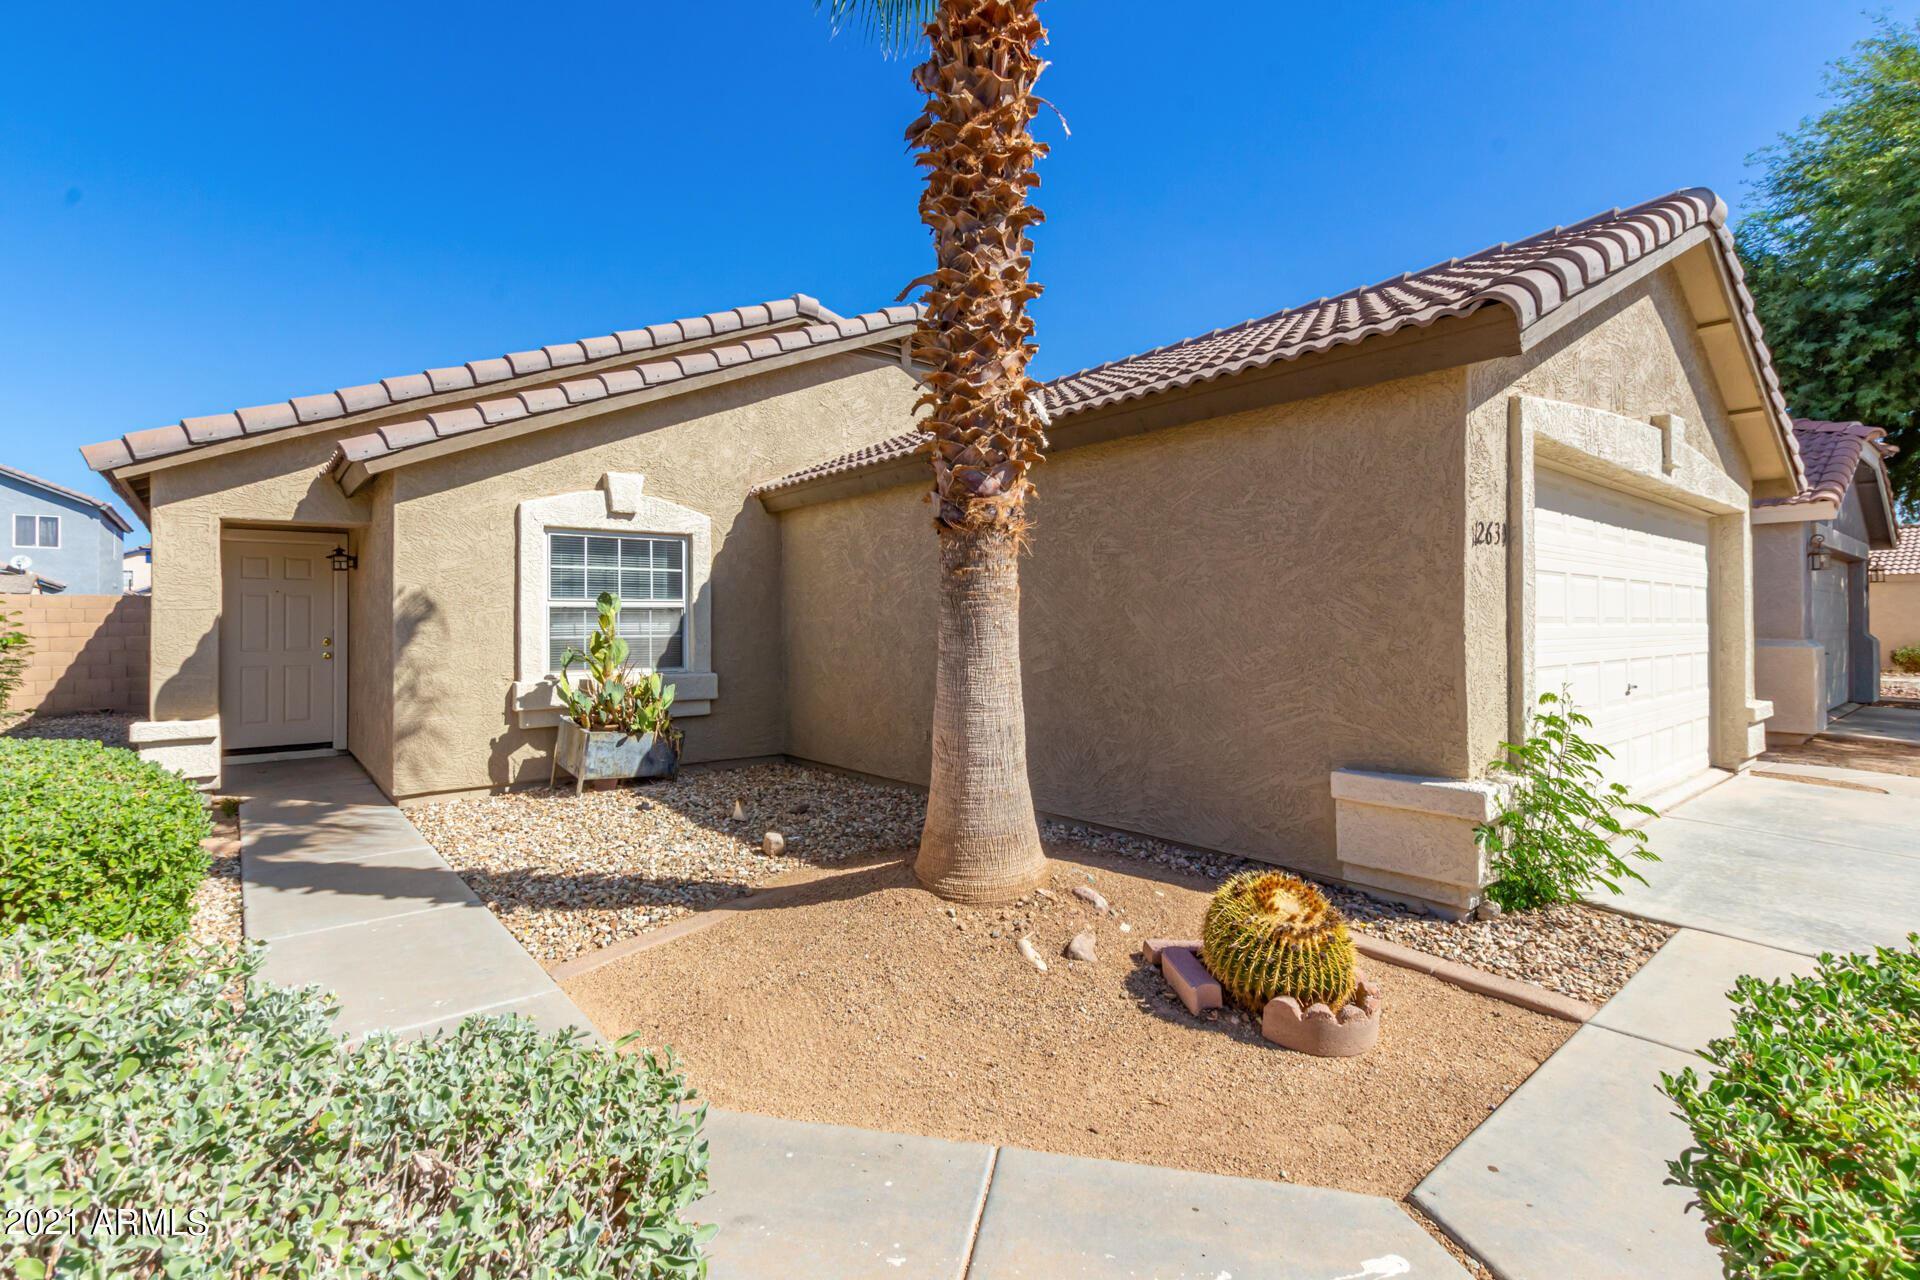 Photo of 12630 W BLOOMFIELD Road, El Mirage, AZ 85335 (MLS # 6304097)